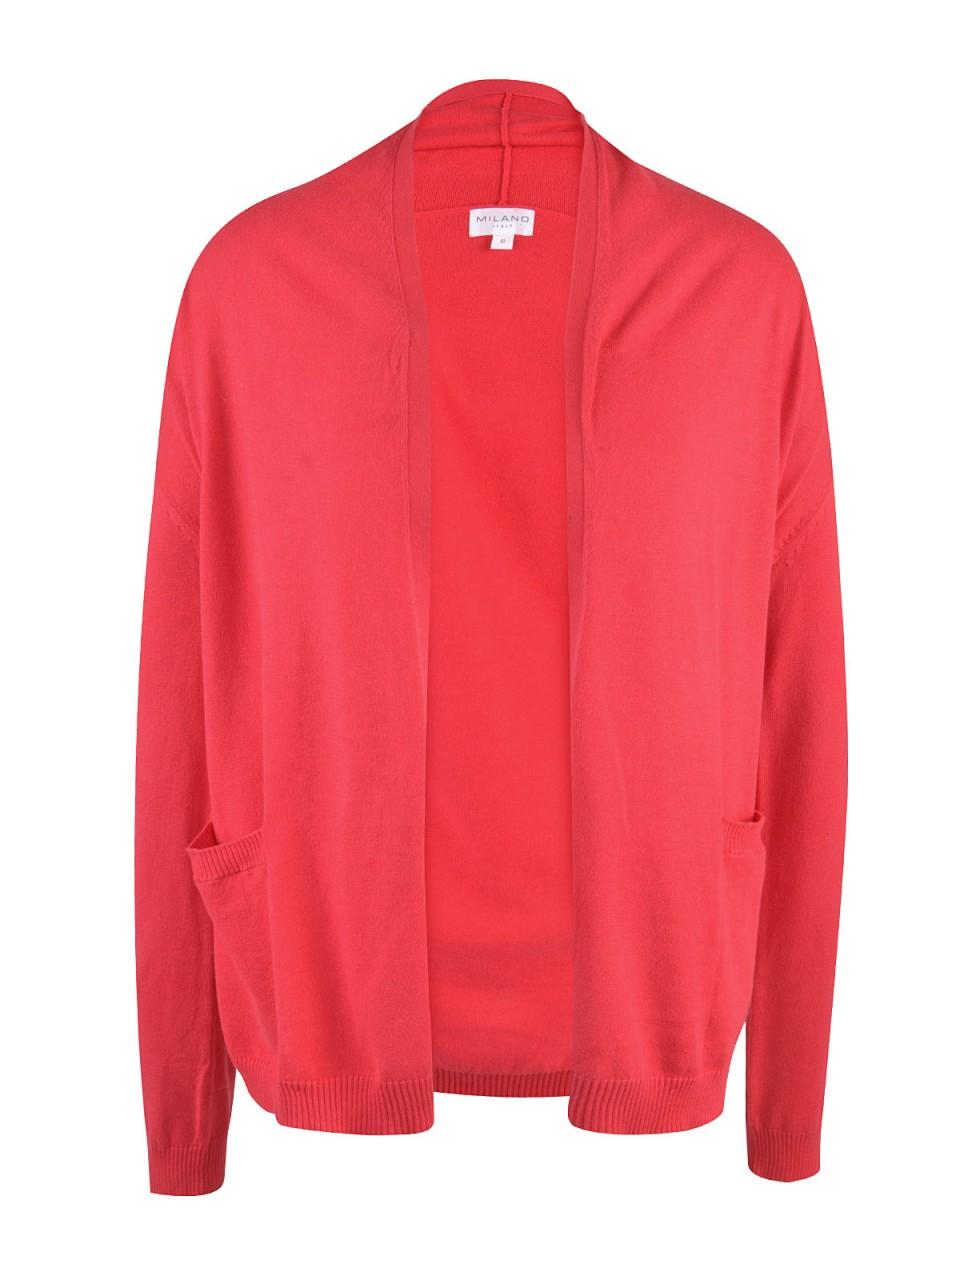 Jacken - MILANO ITALY Damen Cardigan, rot  - Onlineshop Designermode.com